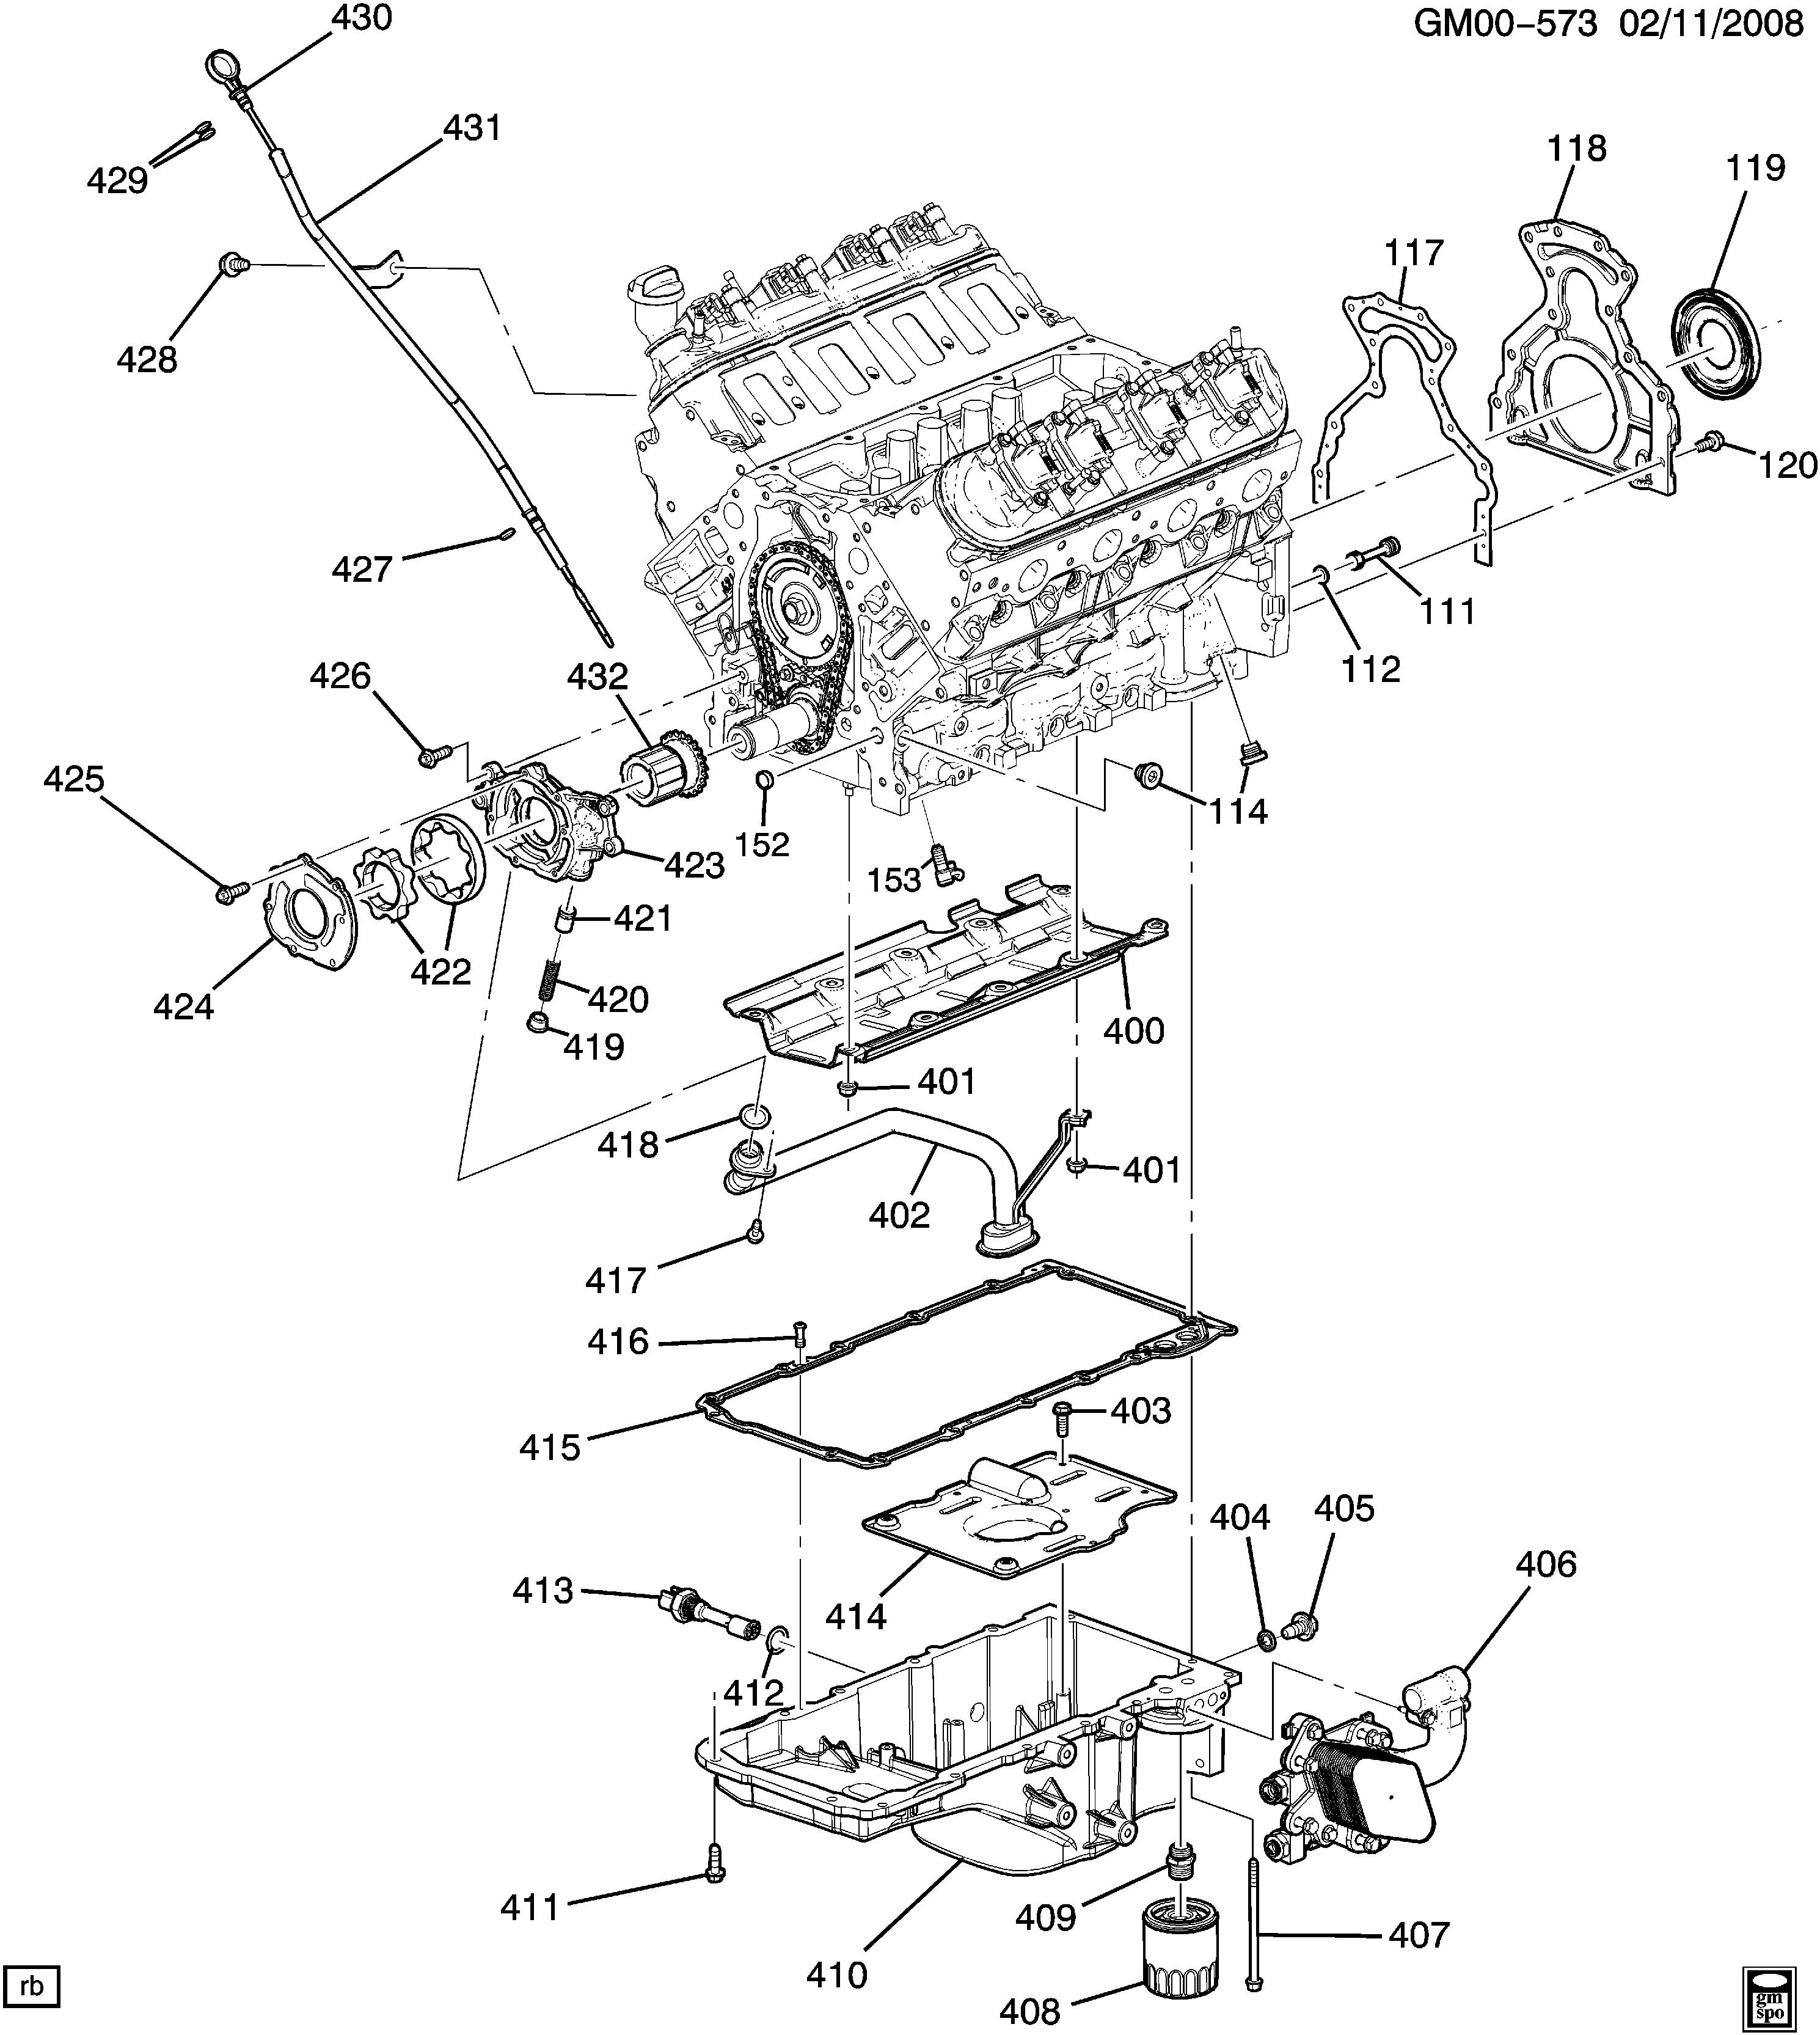 DIAGRAM] Boss 429 Engine Diagram FULL Version HD Quality Engine Diagram -  SHAREDIAGRAMS.MUSEOTRESNURAGHES.ITDiagram Database - museotresnuraghes.it